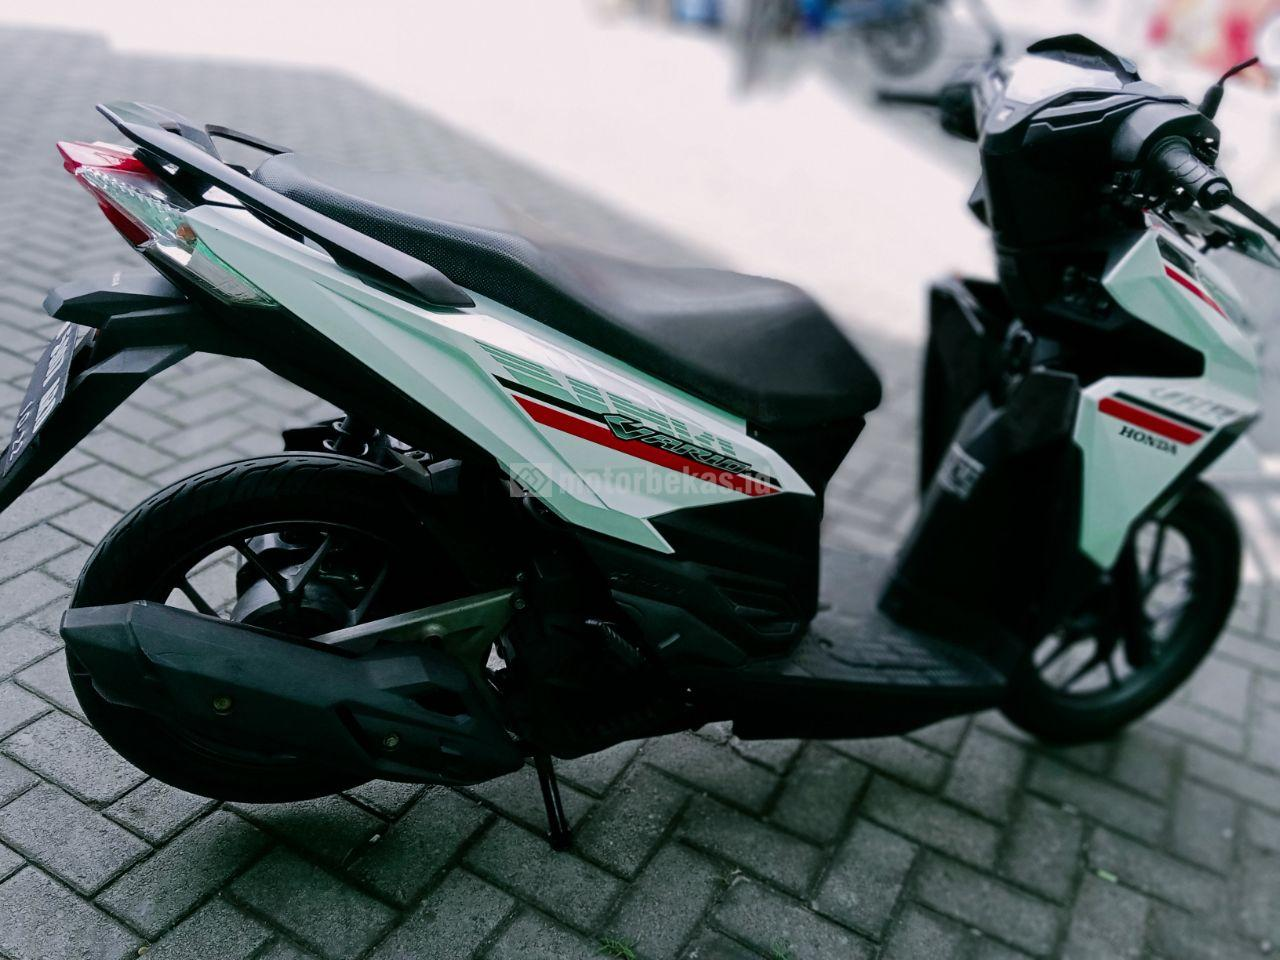 HONDA VARIO 125 FI 3201 motorbekas.id